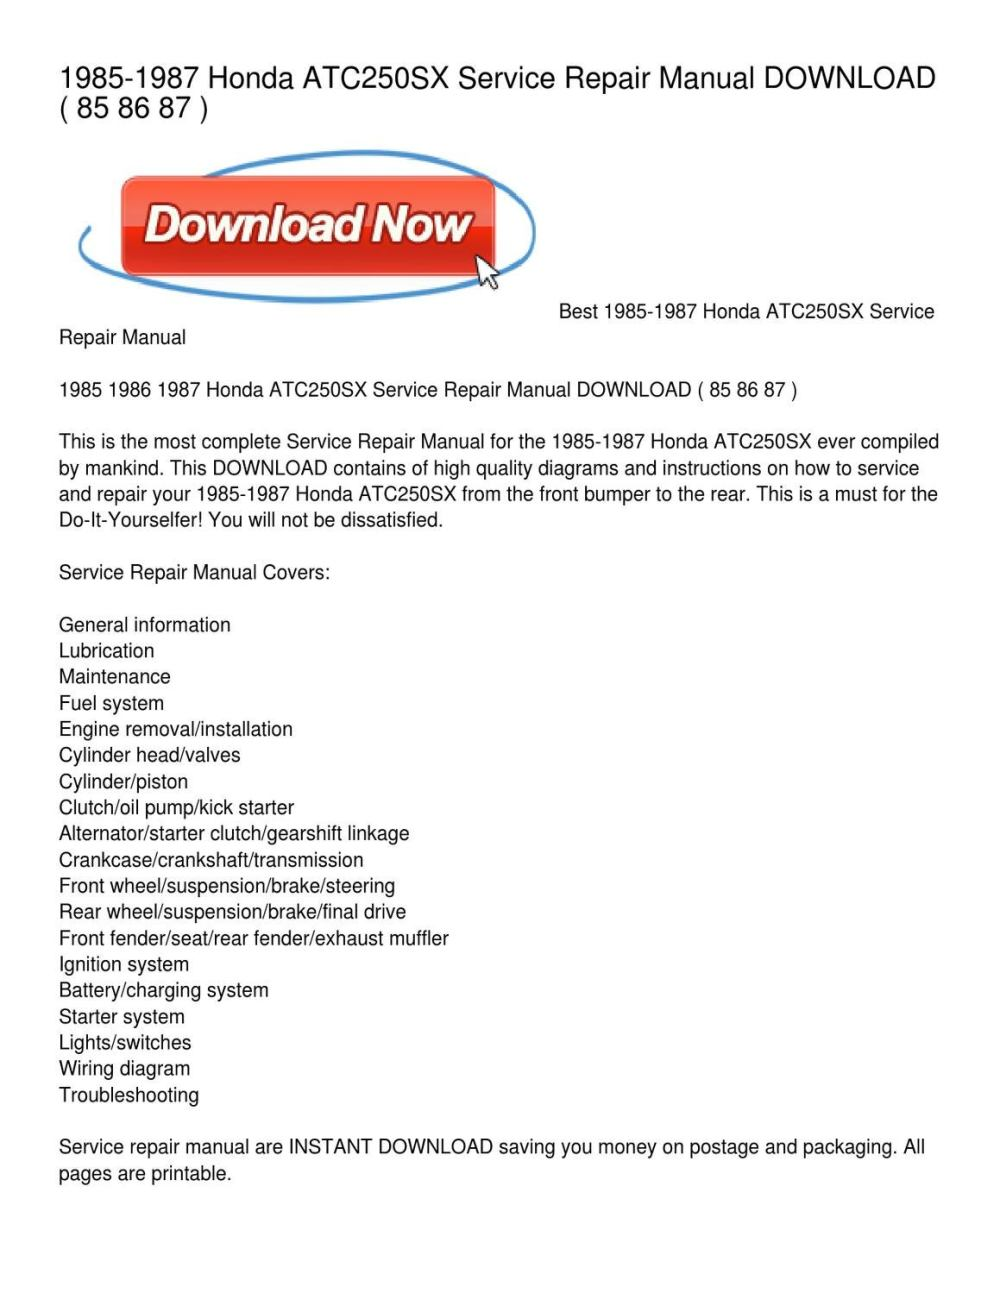 medium resolution of 1985 1987 honda atc250sx service repair manual by leonard colmenero issuu honda atc250sx wiring diagram